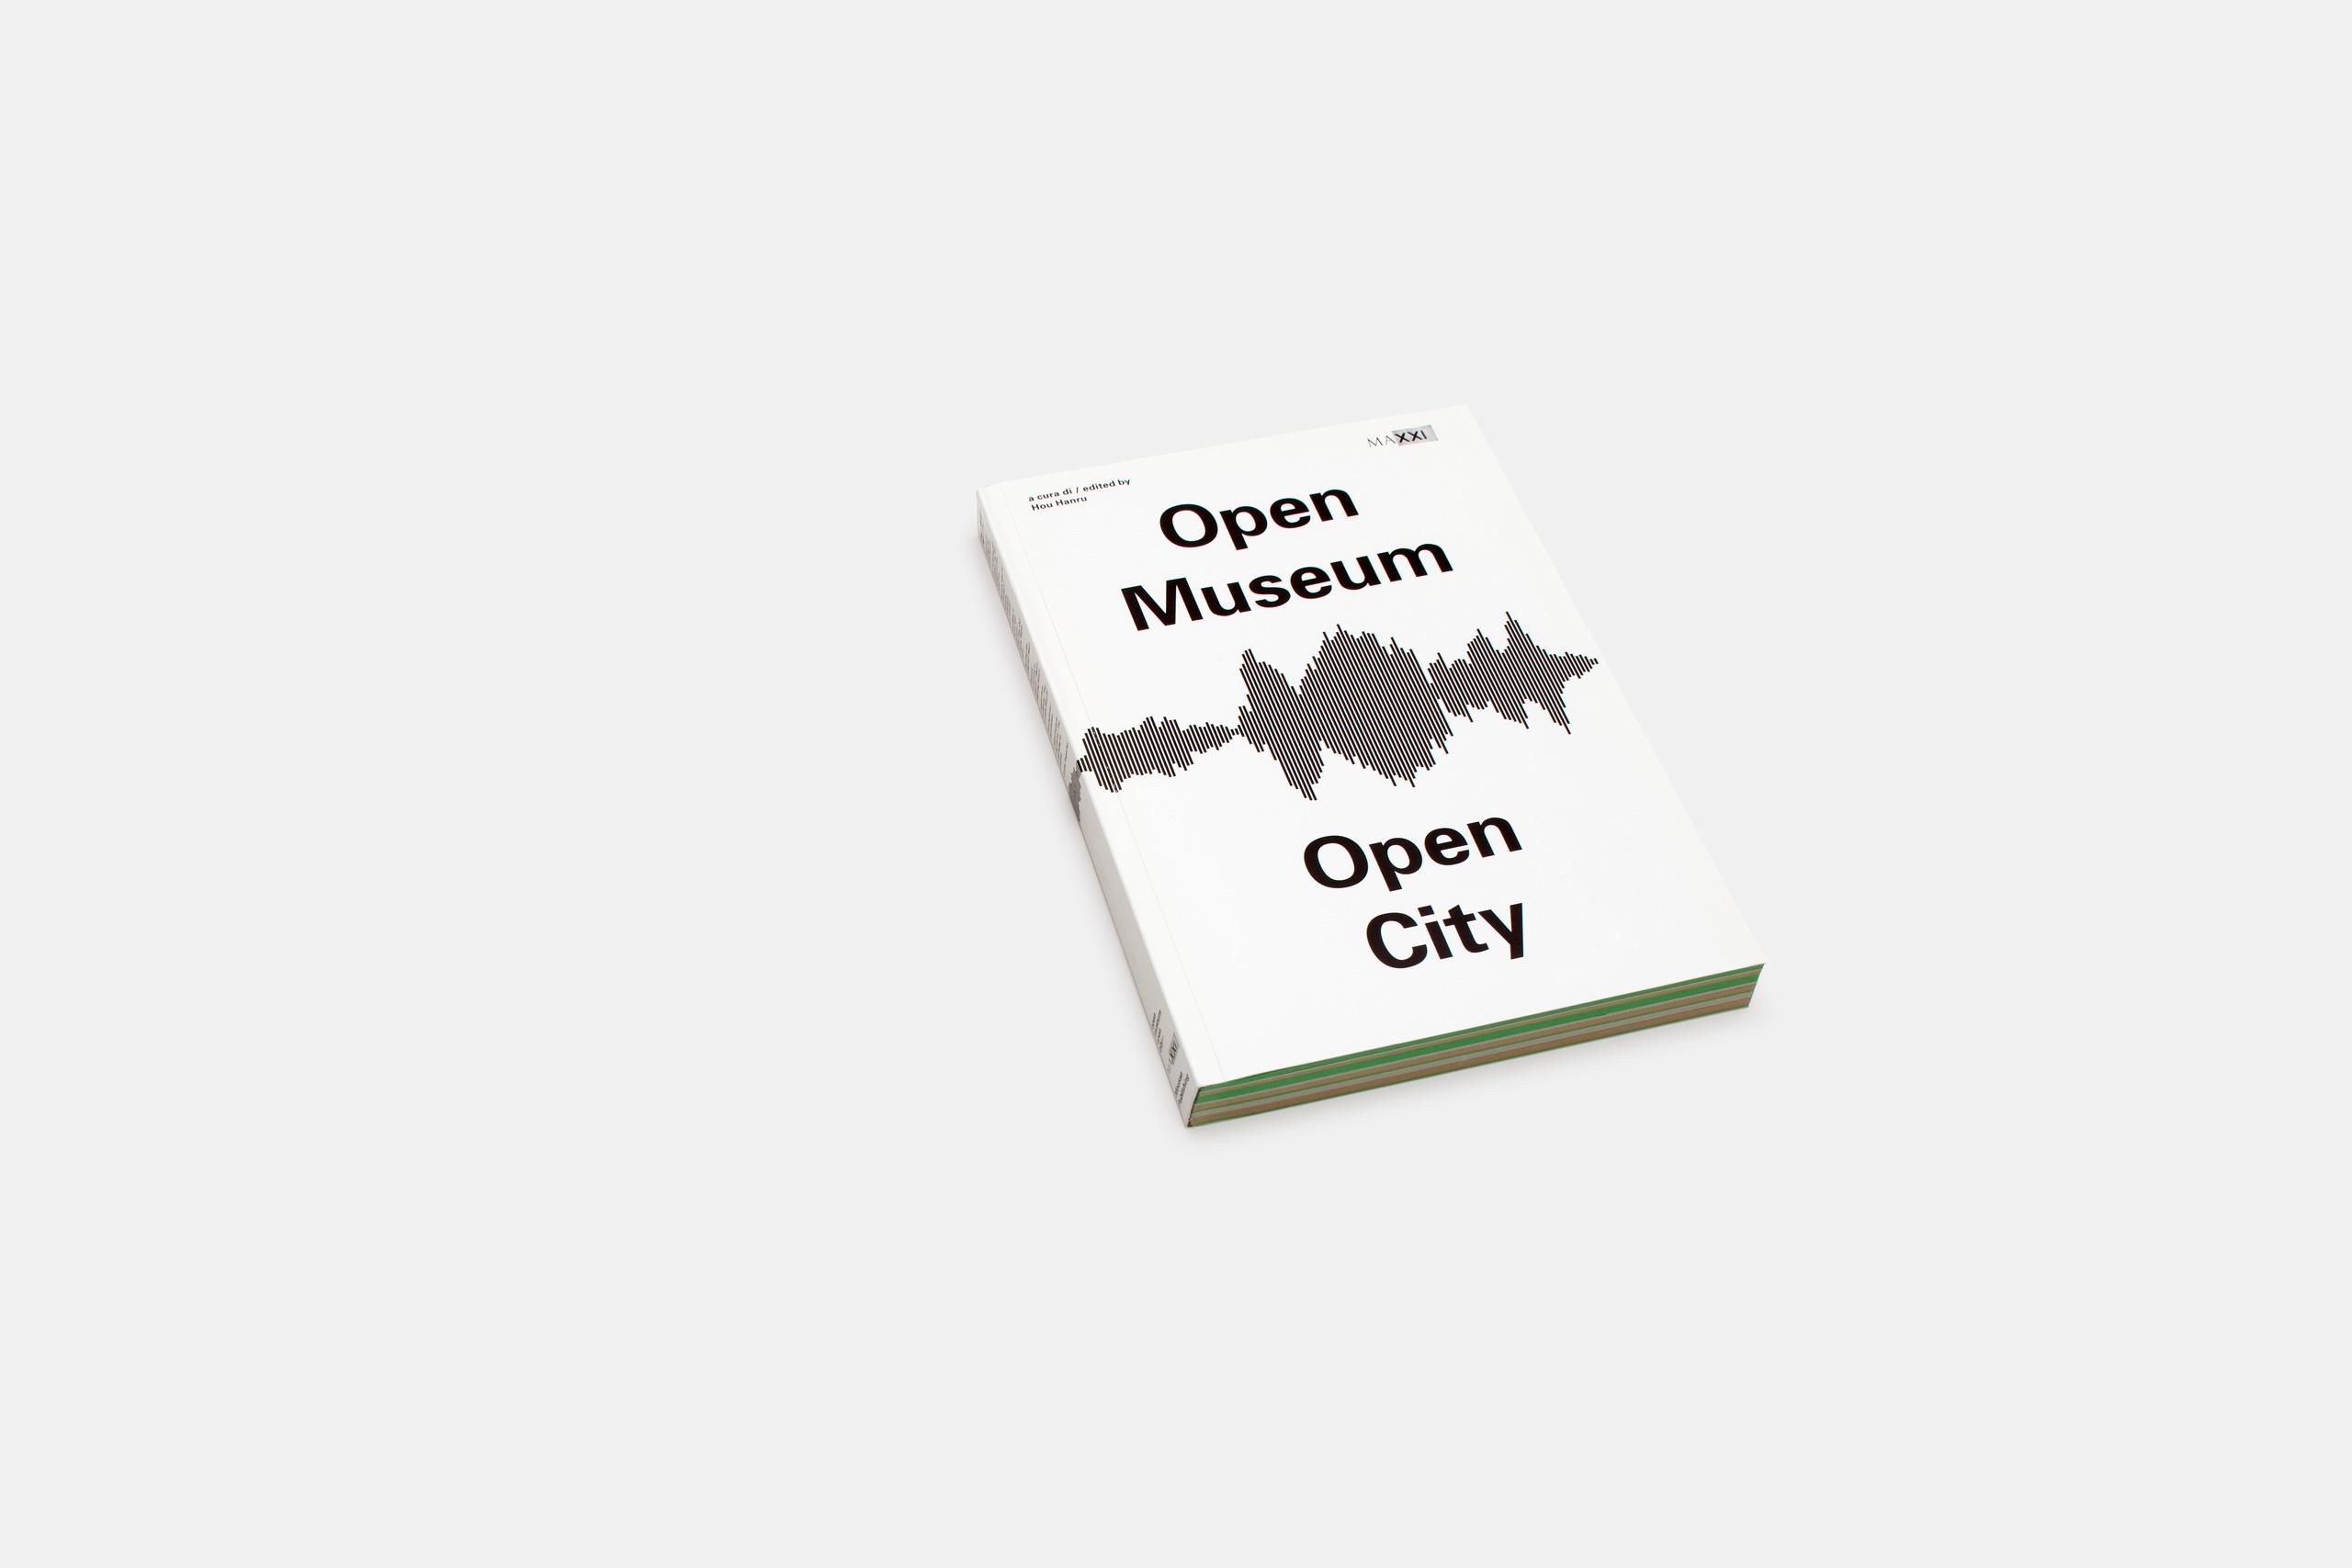 Open_Museum_Open_City_Maxxi_Documentary_Platform_2014_02